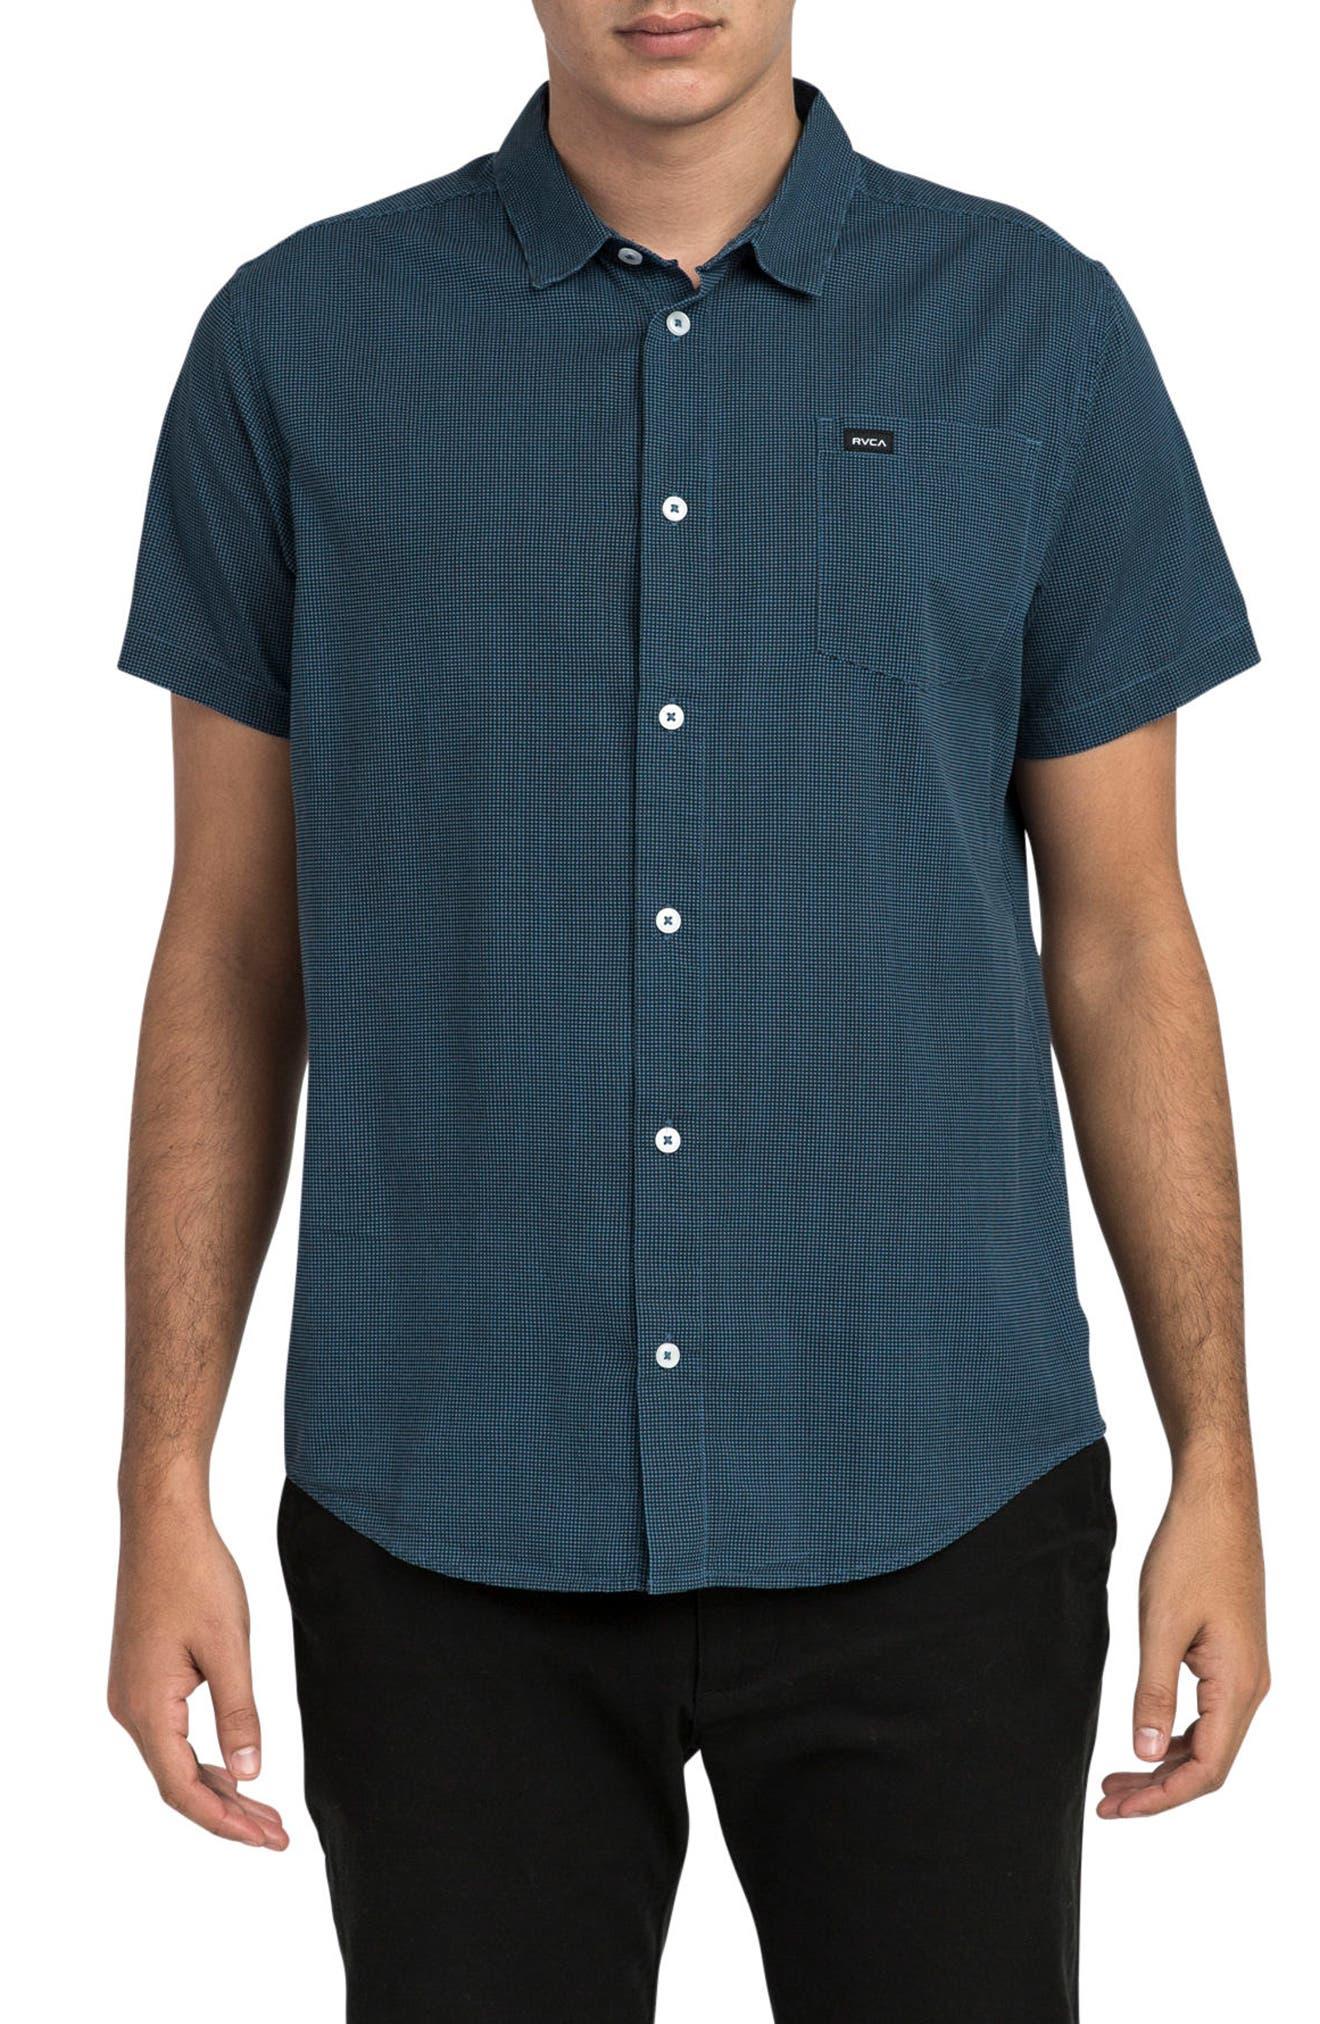 RVCA No Name Woven Shirt